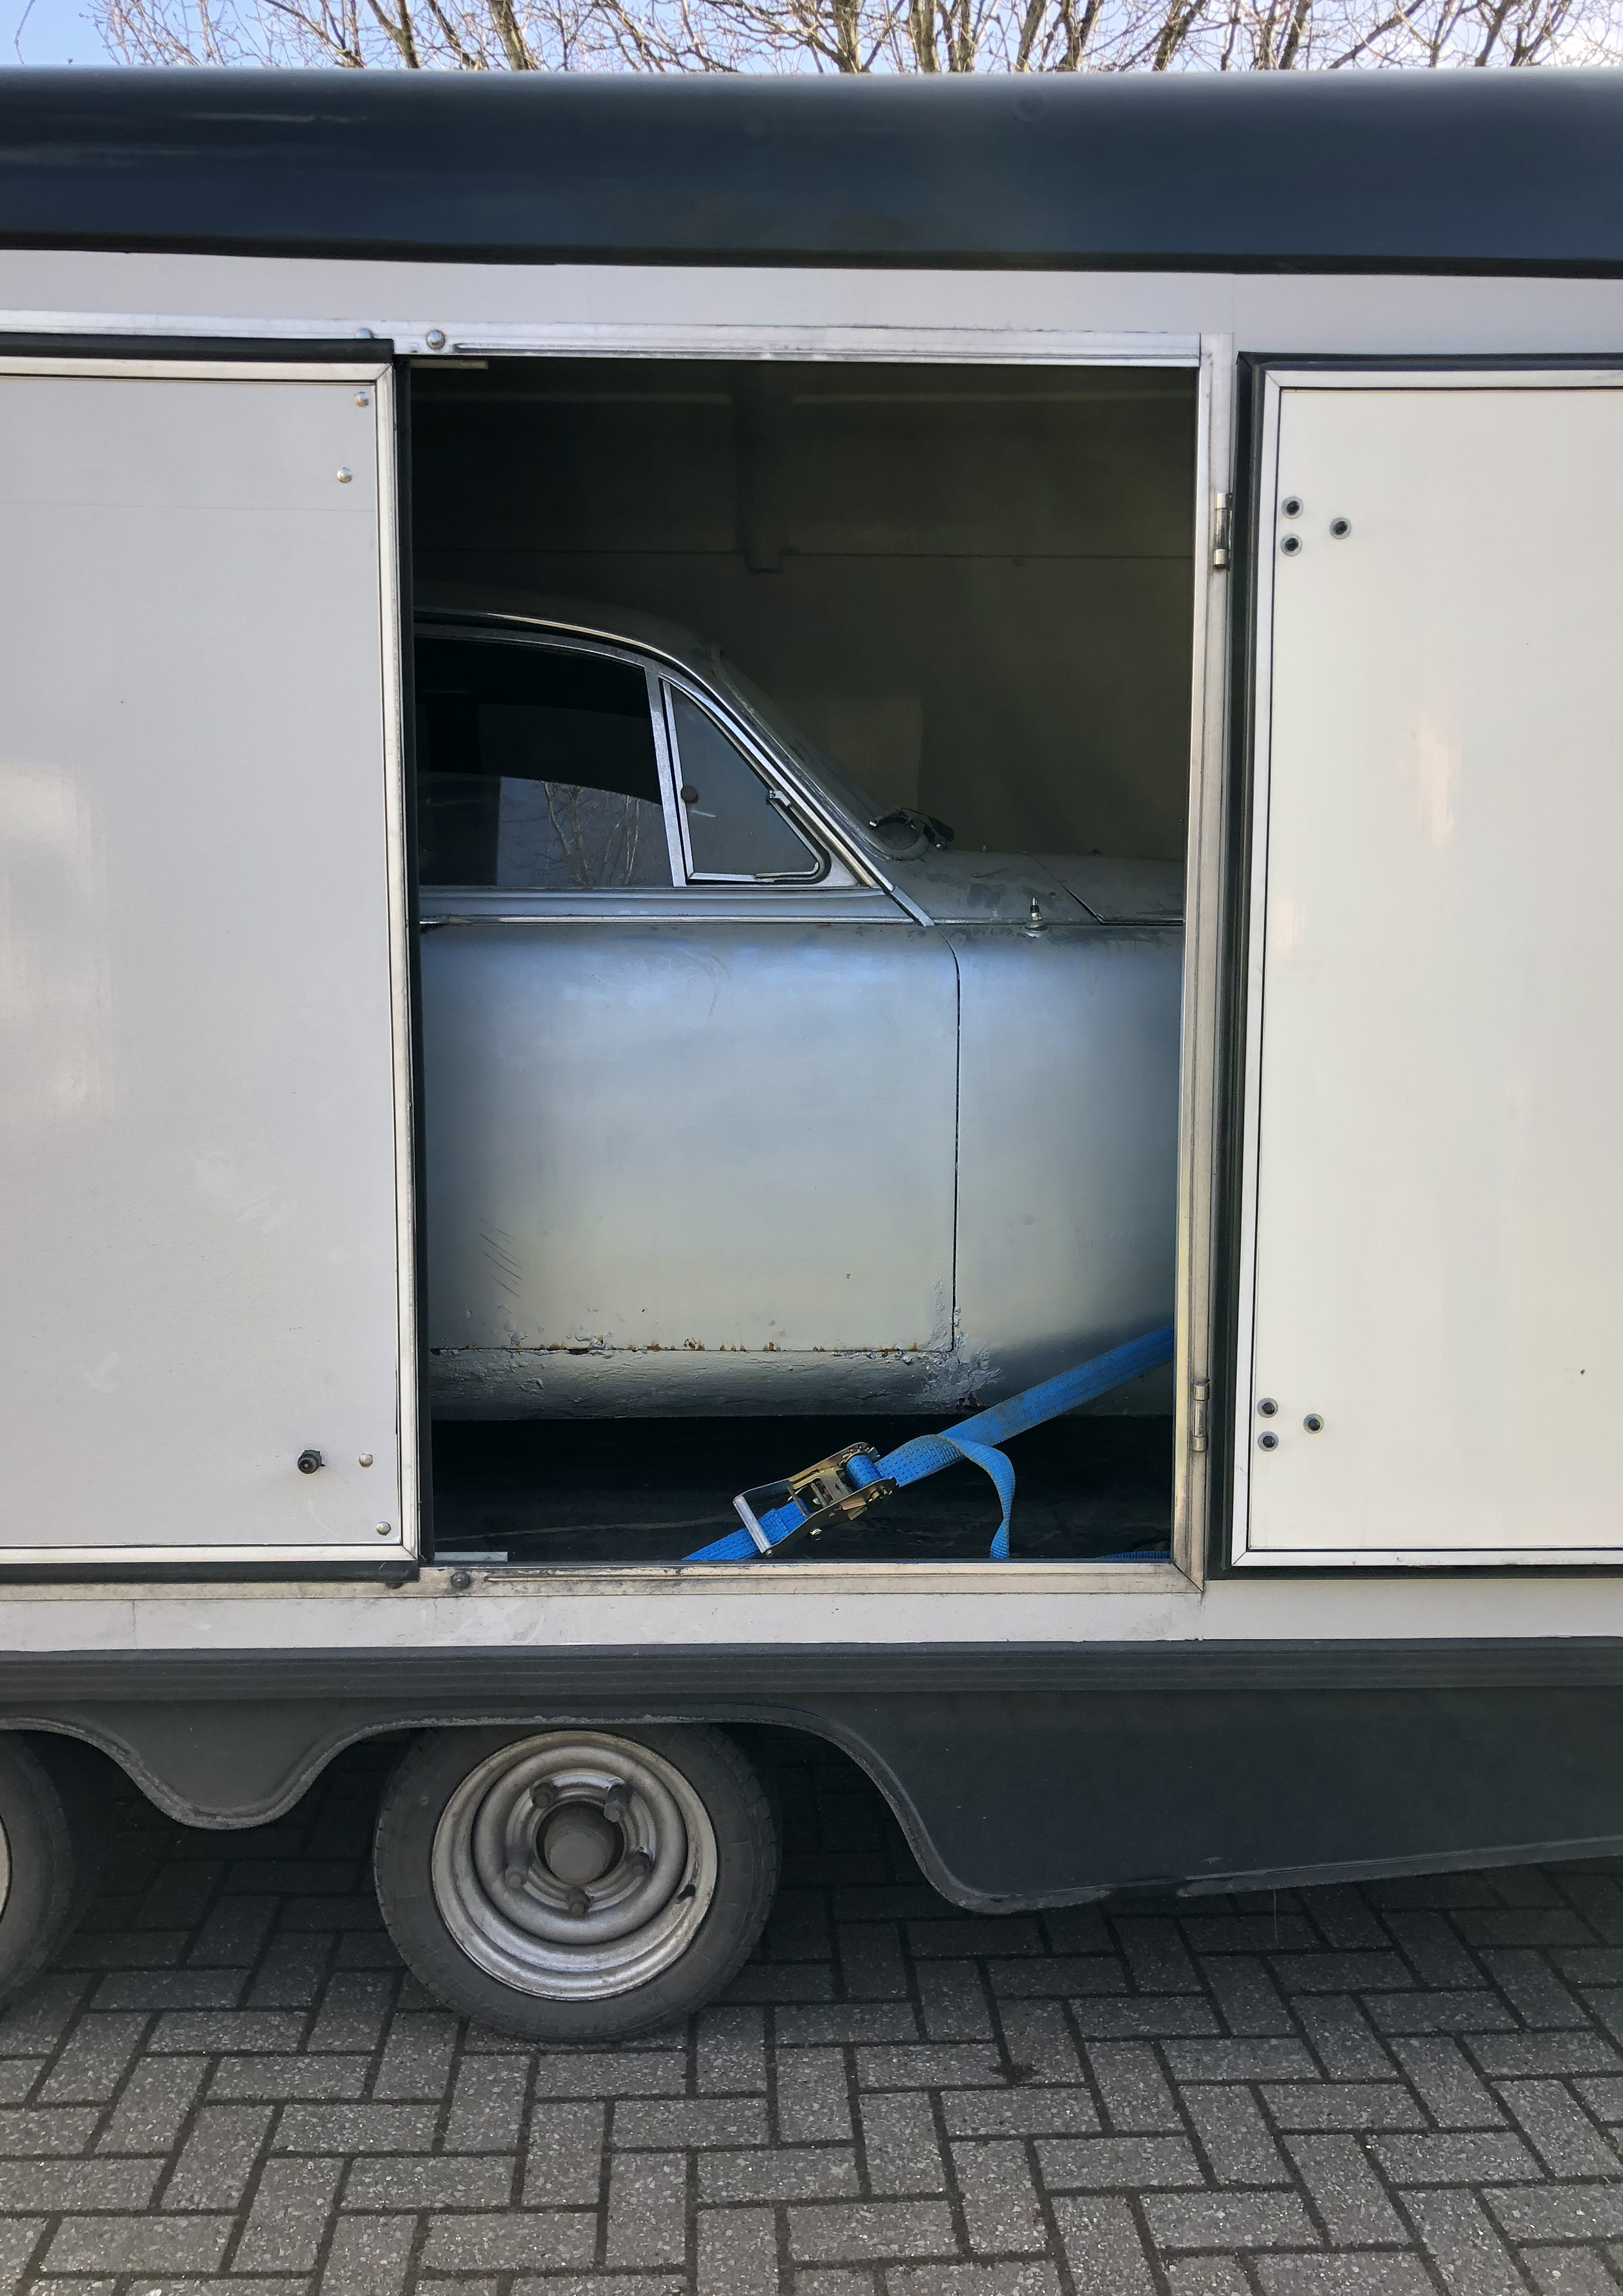 barnfind in trailer.jpg